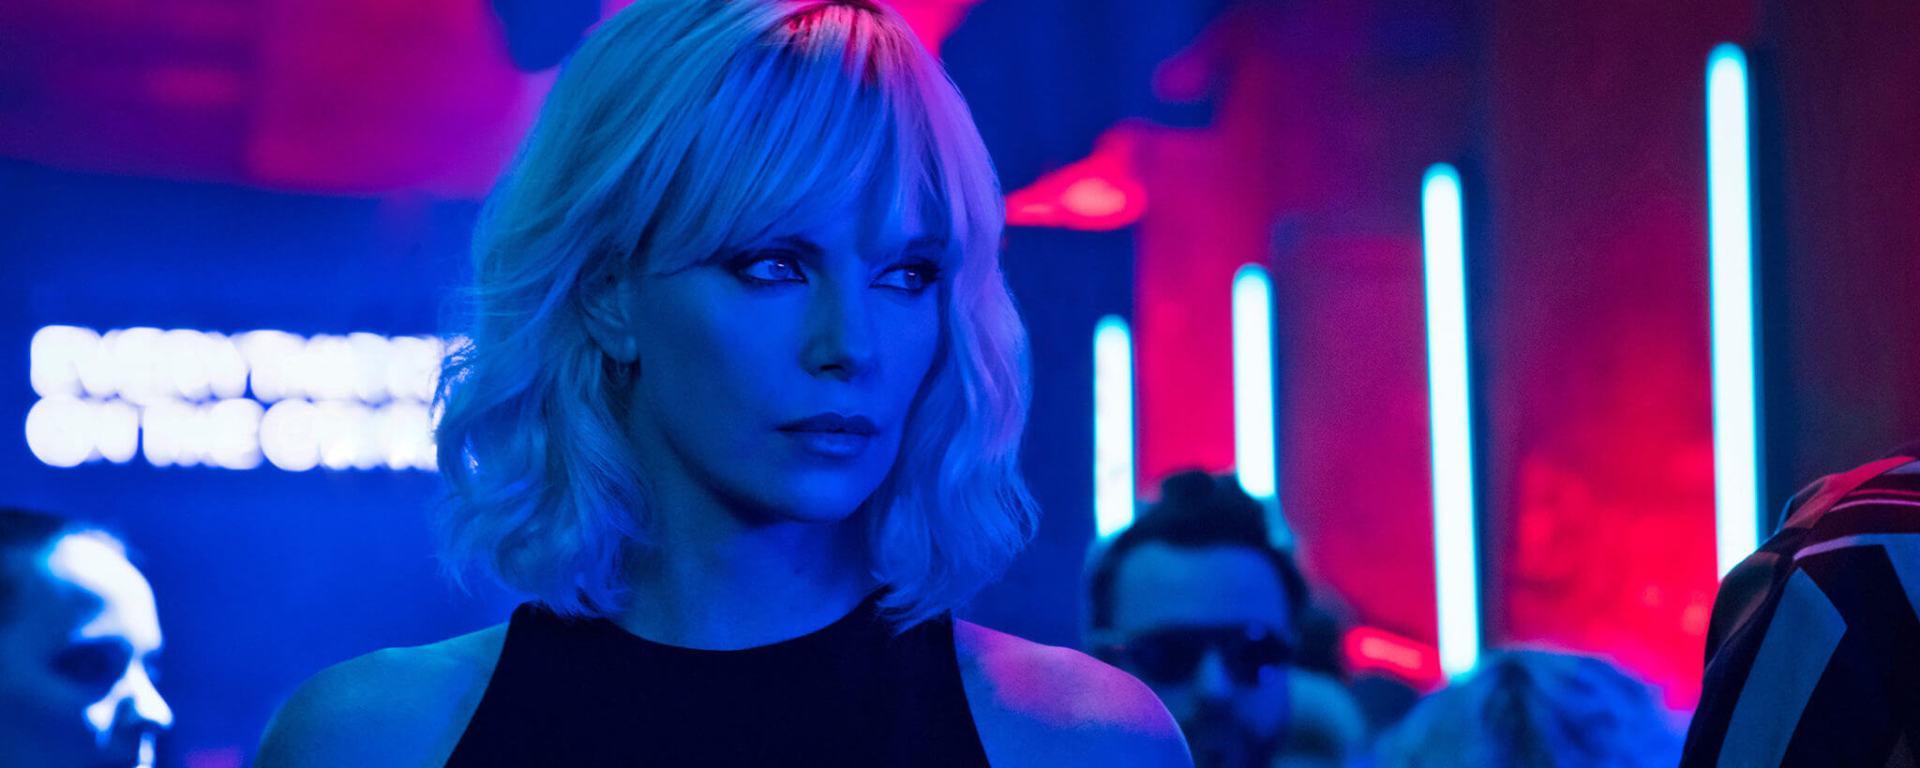 Atomic-Blonde-Cine,a-Gizmo